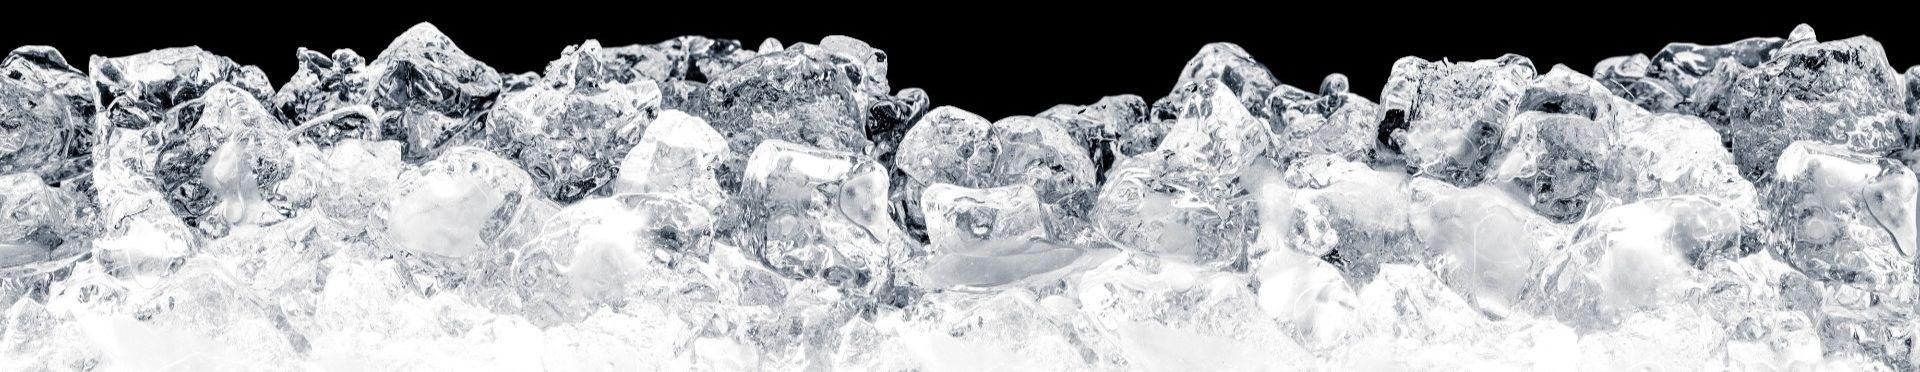 iceblast europe, coulson iceblast, coulson